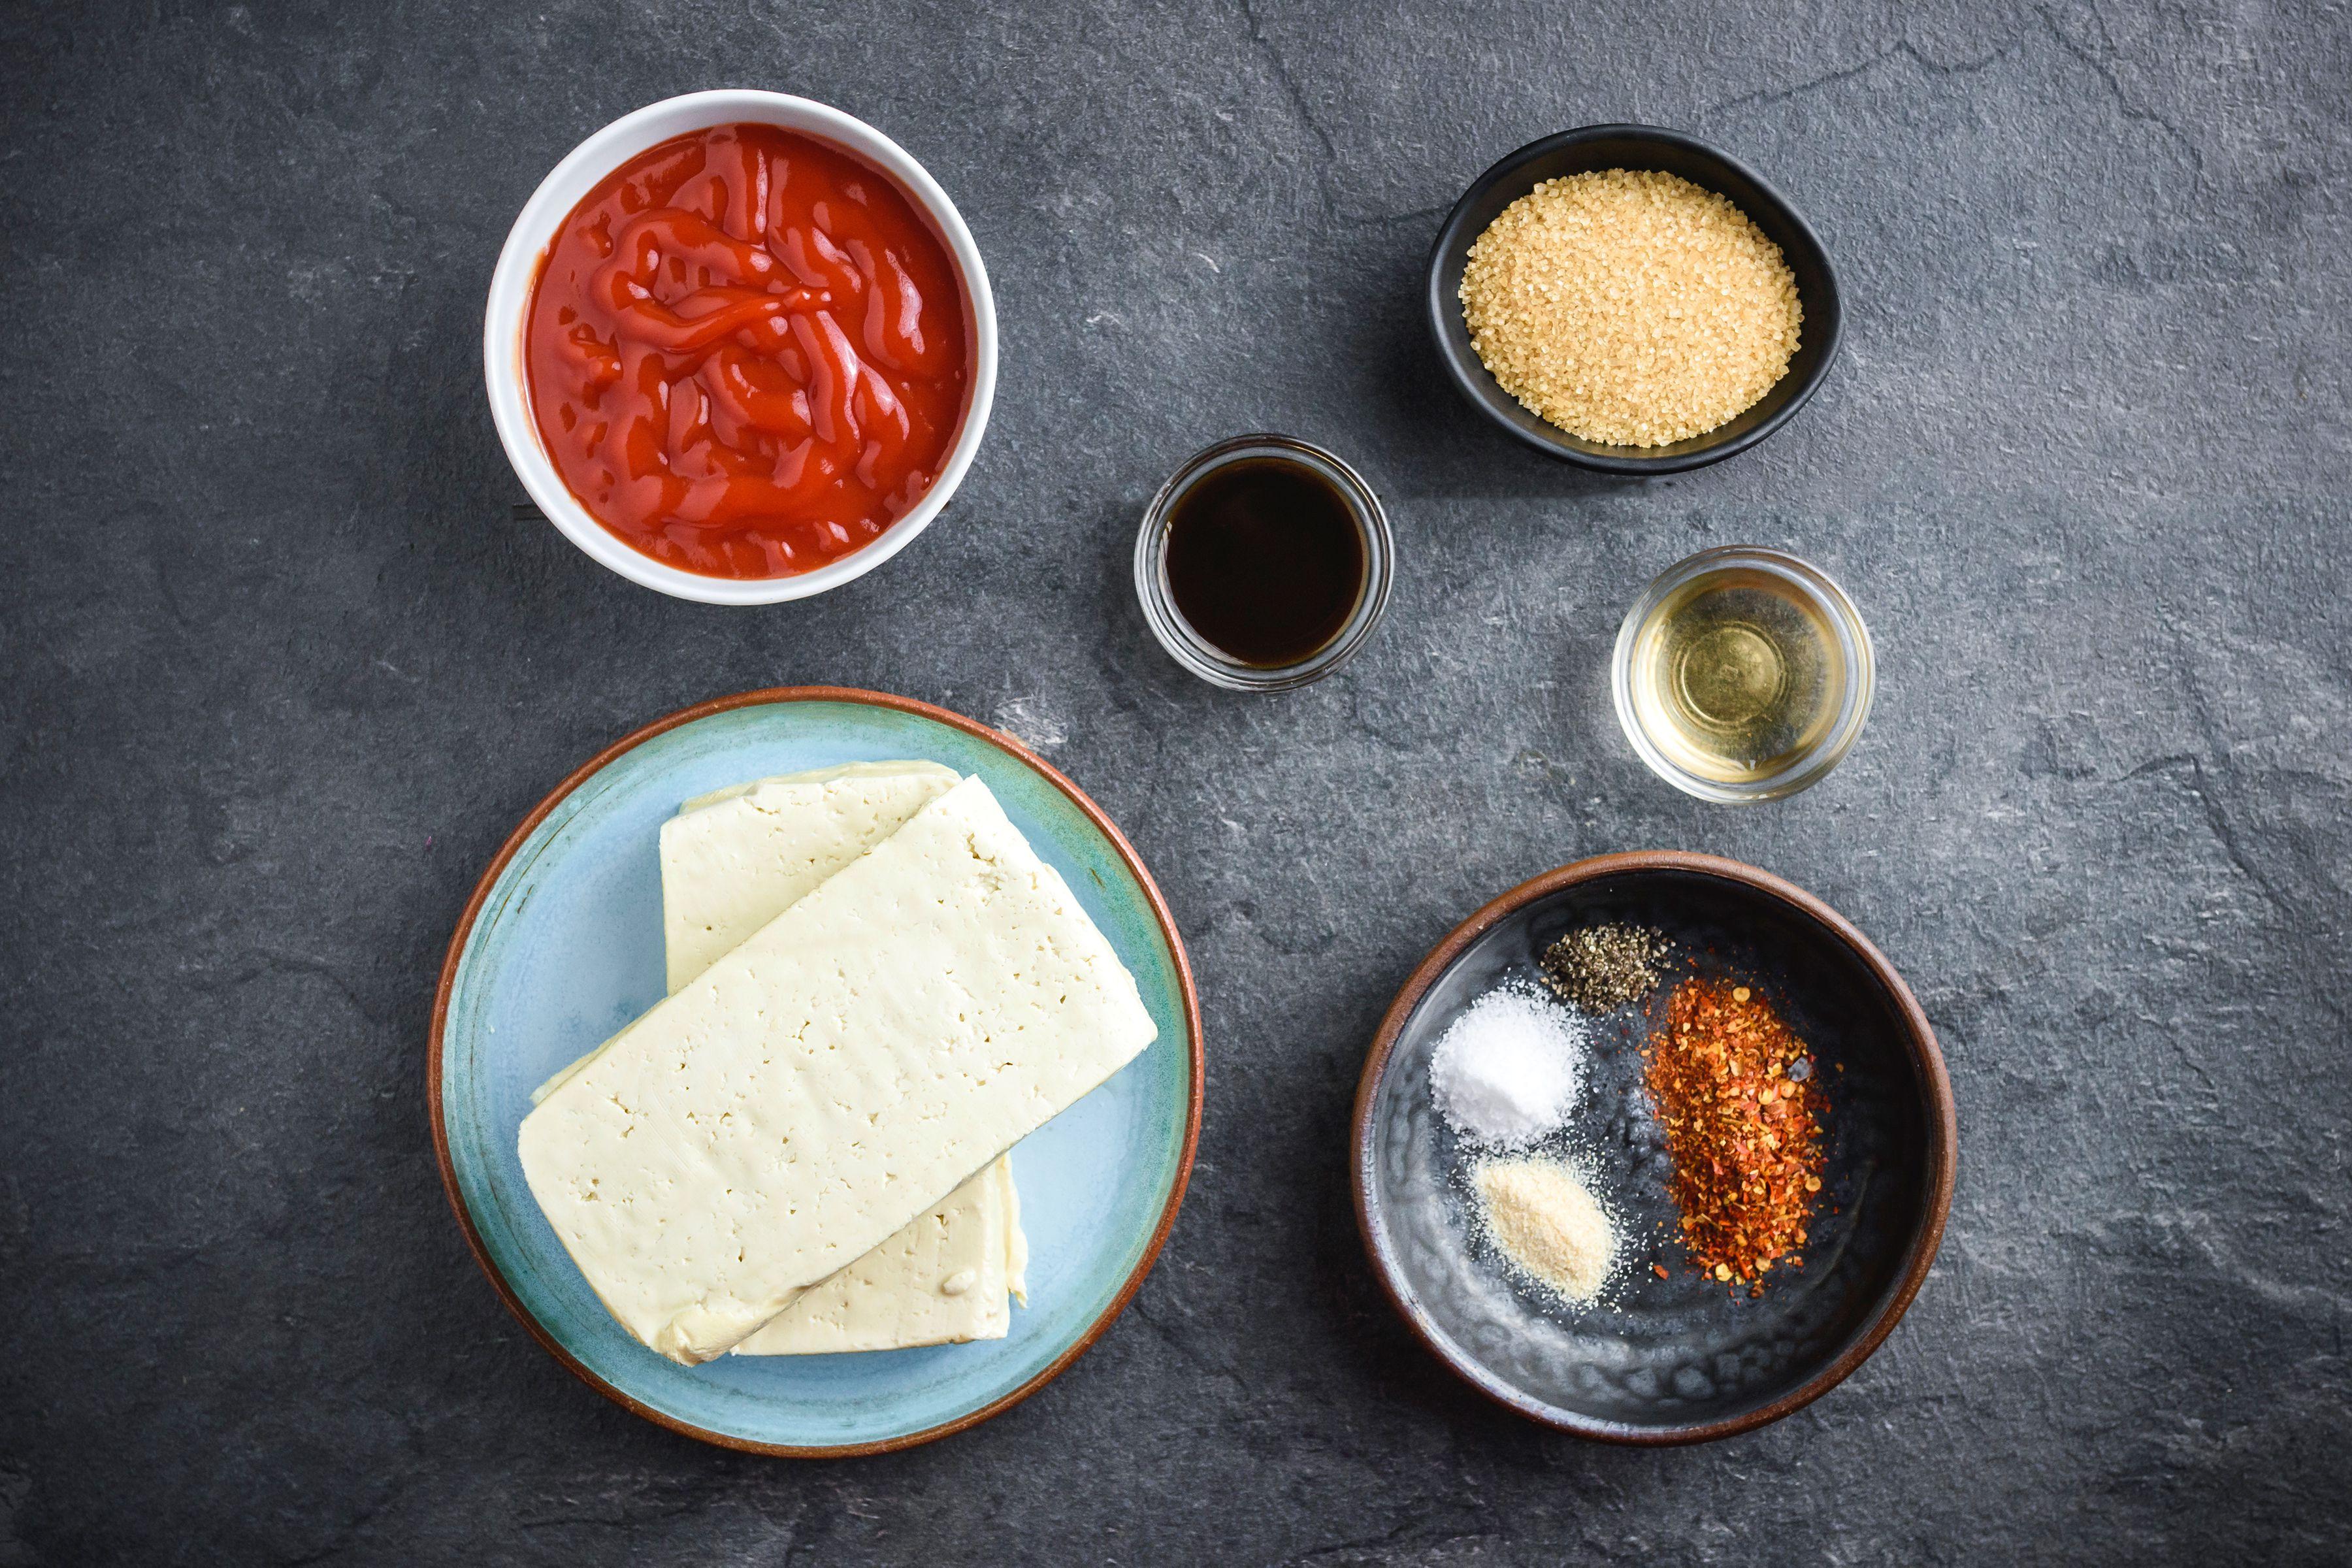 Vegan Crock Pot Barbecue Tofu Recipe ingredients